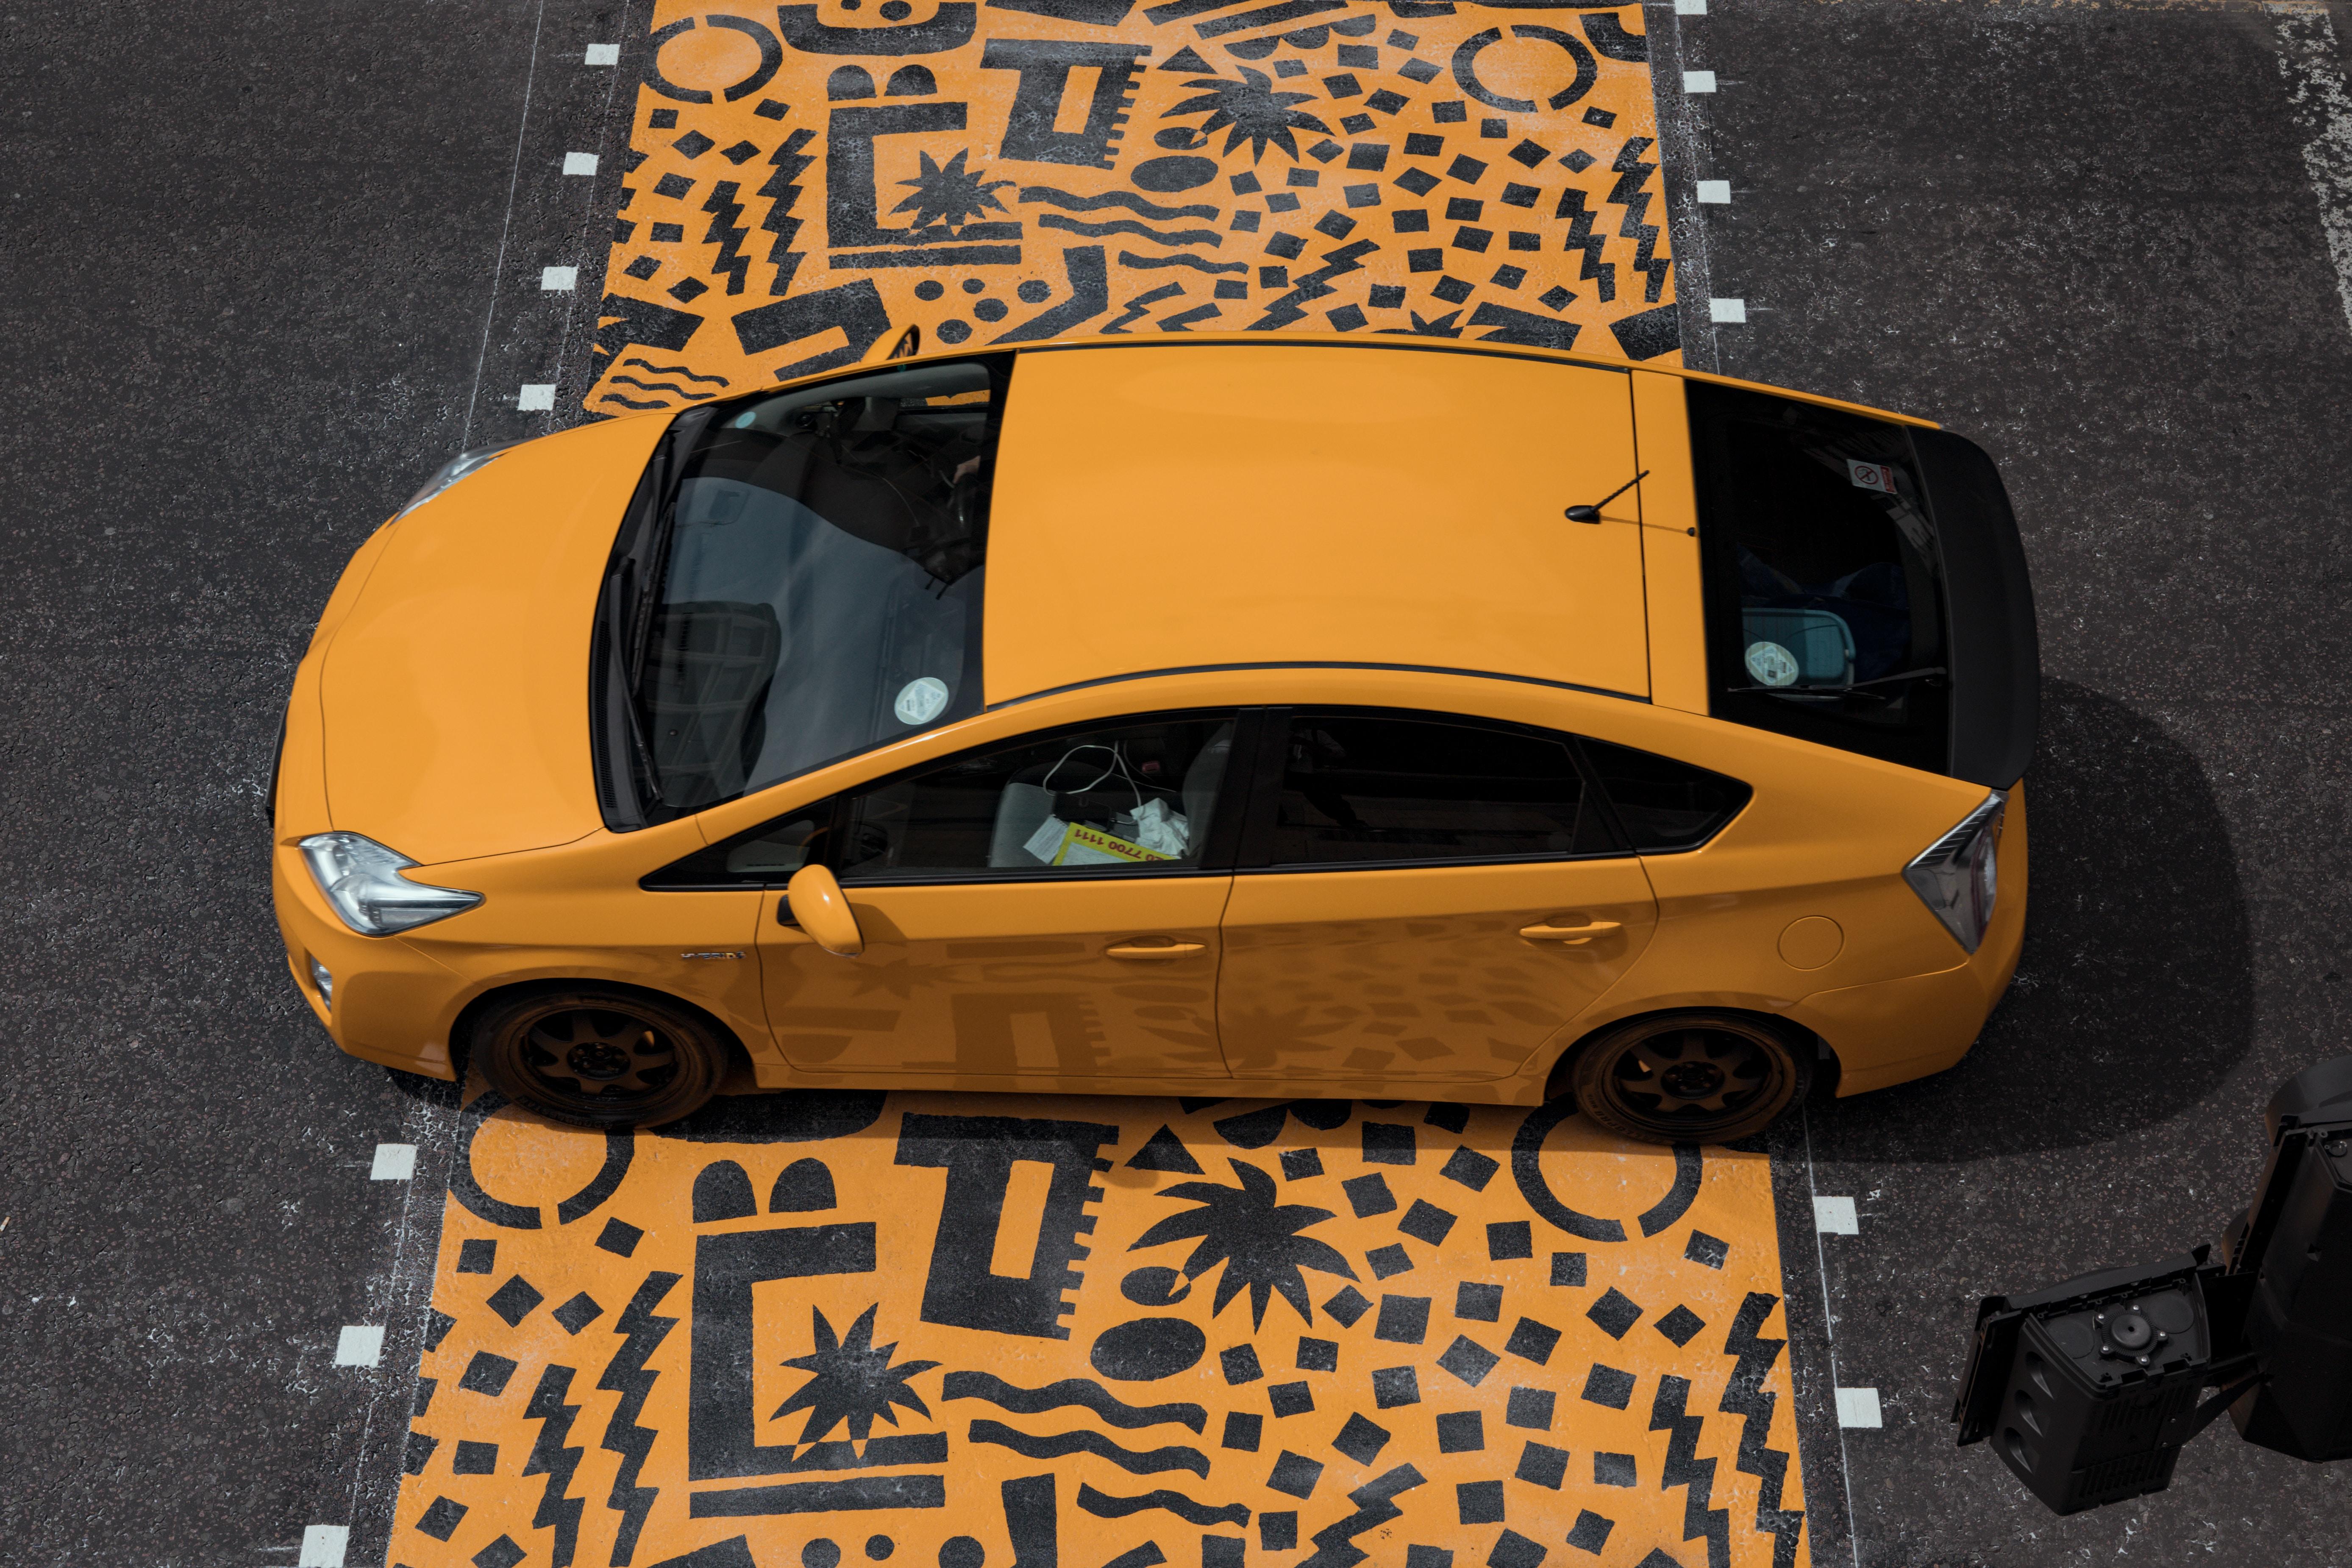 yellow sedan parked on yellow and black floor